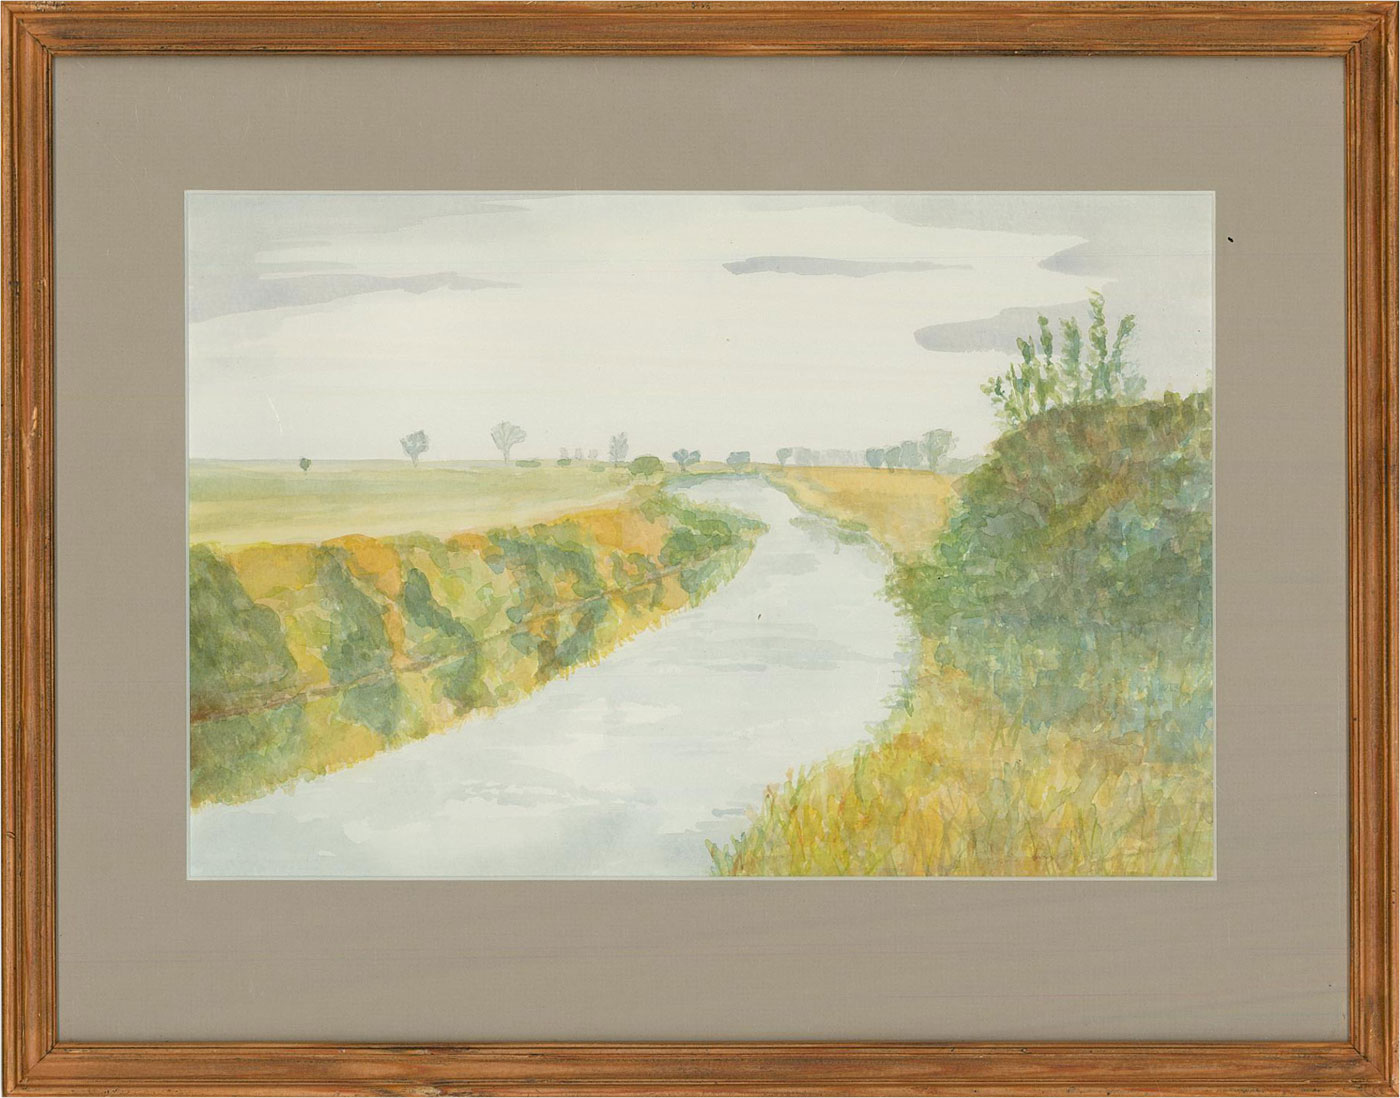 L.V. - 20th Century Watercolour, Rural River View